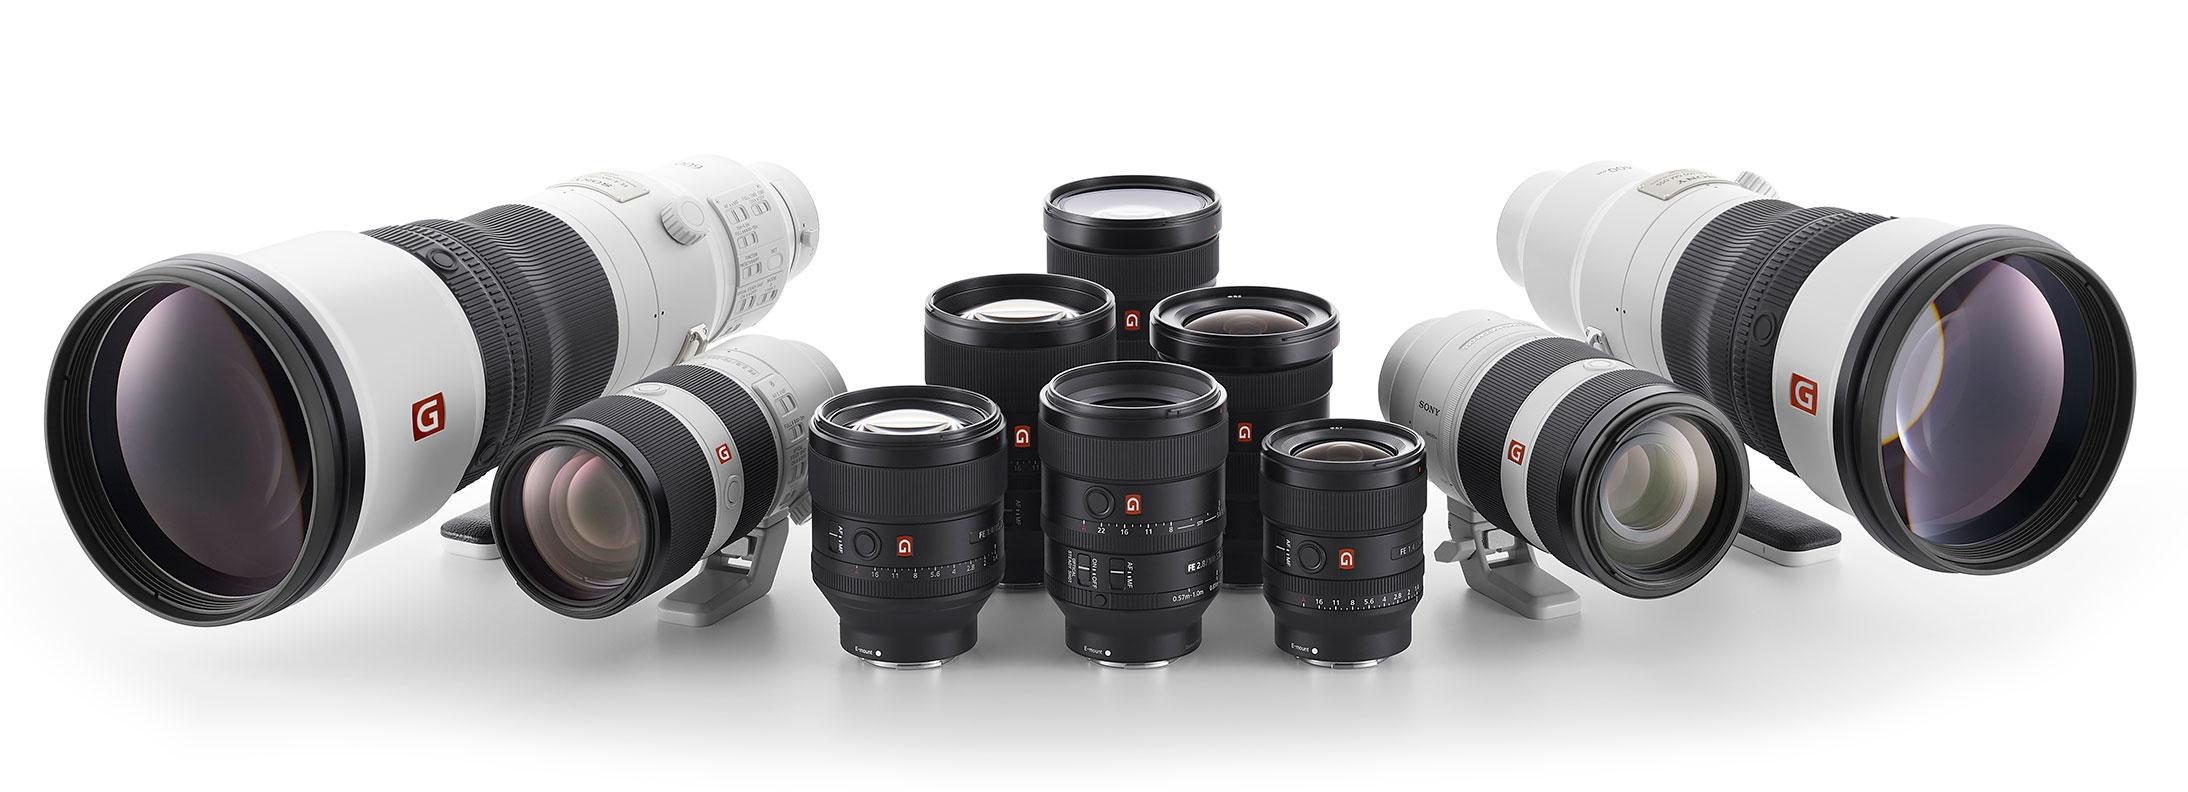 GMaster Lens group